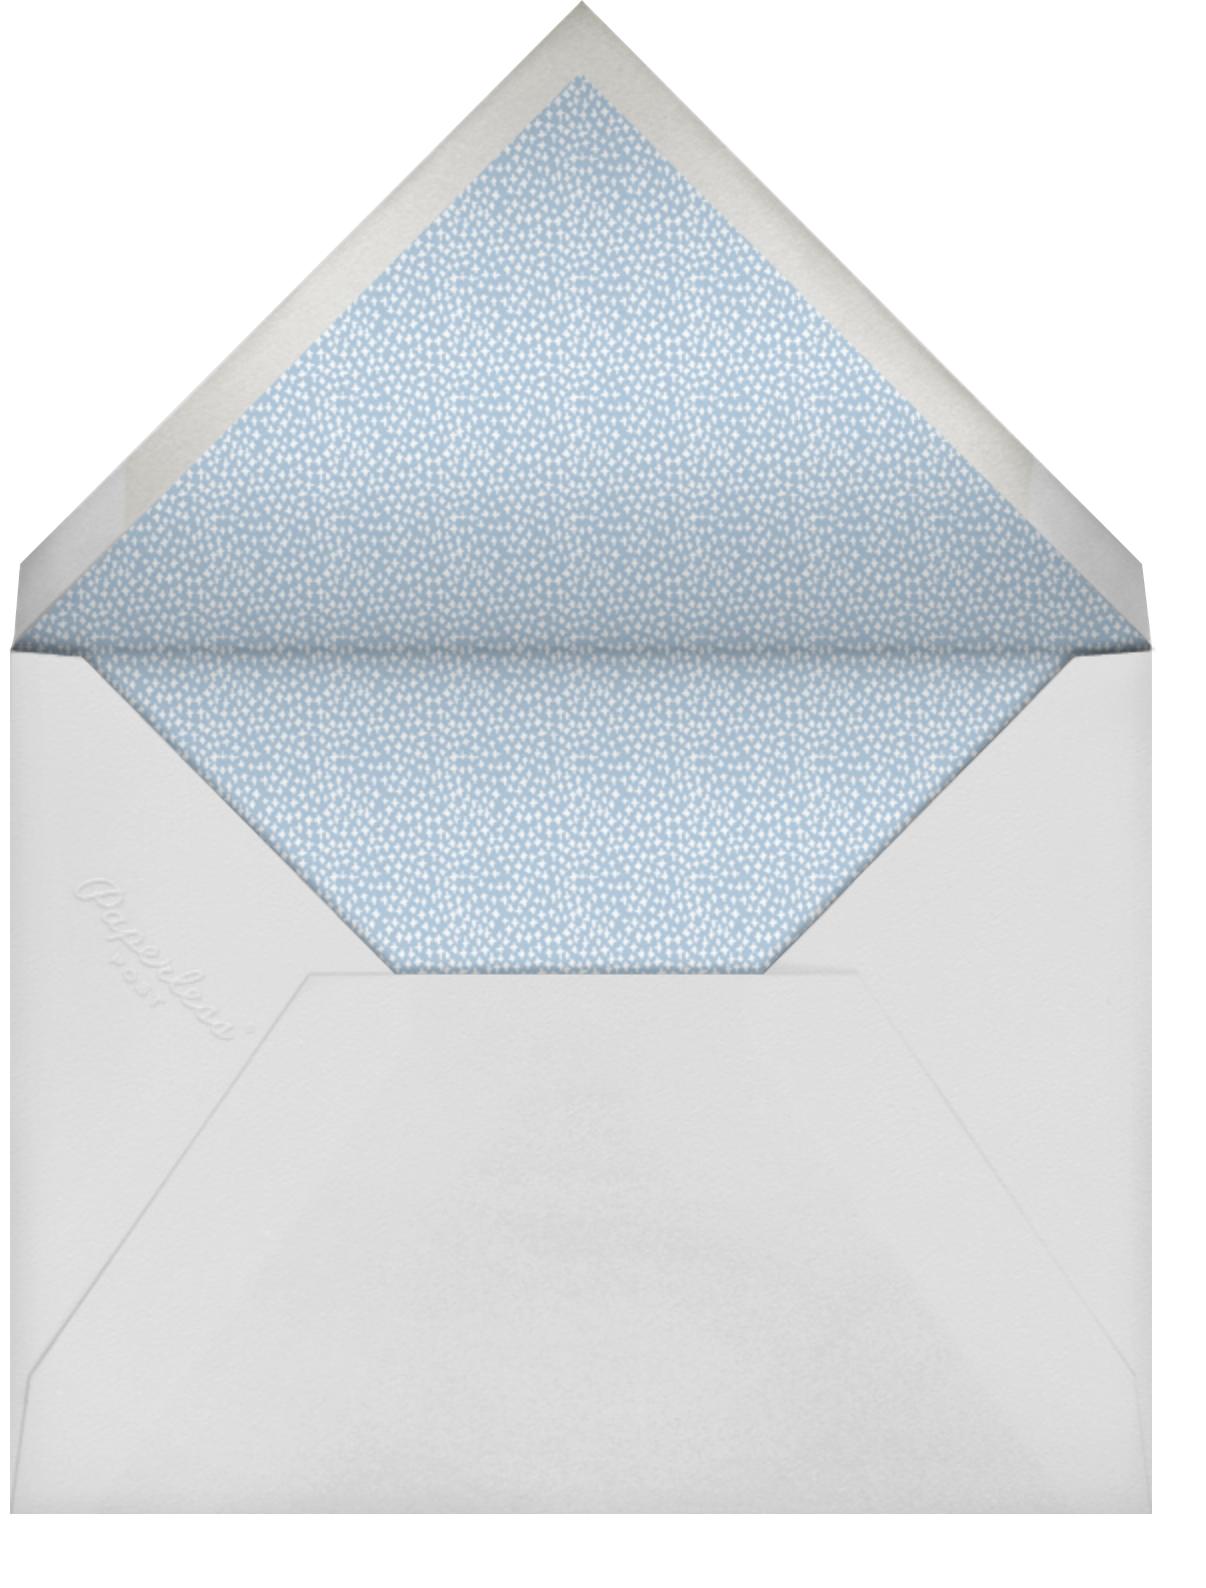 Up in the Air - Blue - Mr. Boddington's Studio - Baby shower - envelope back